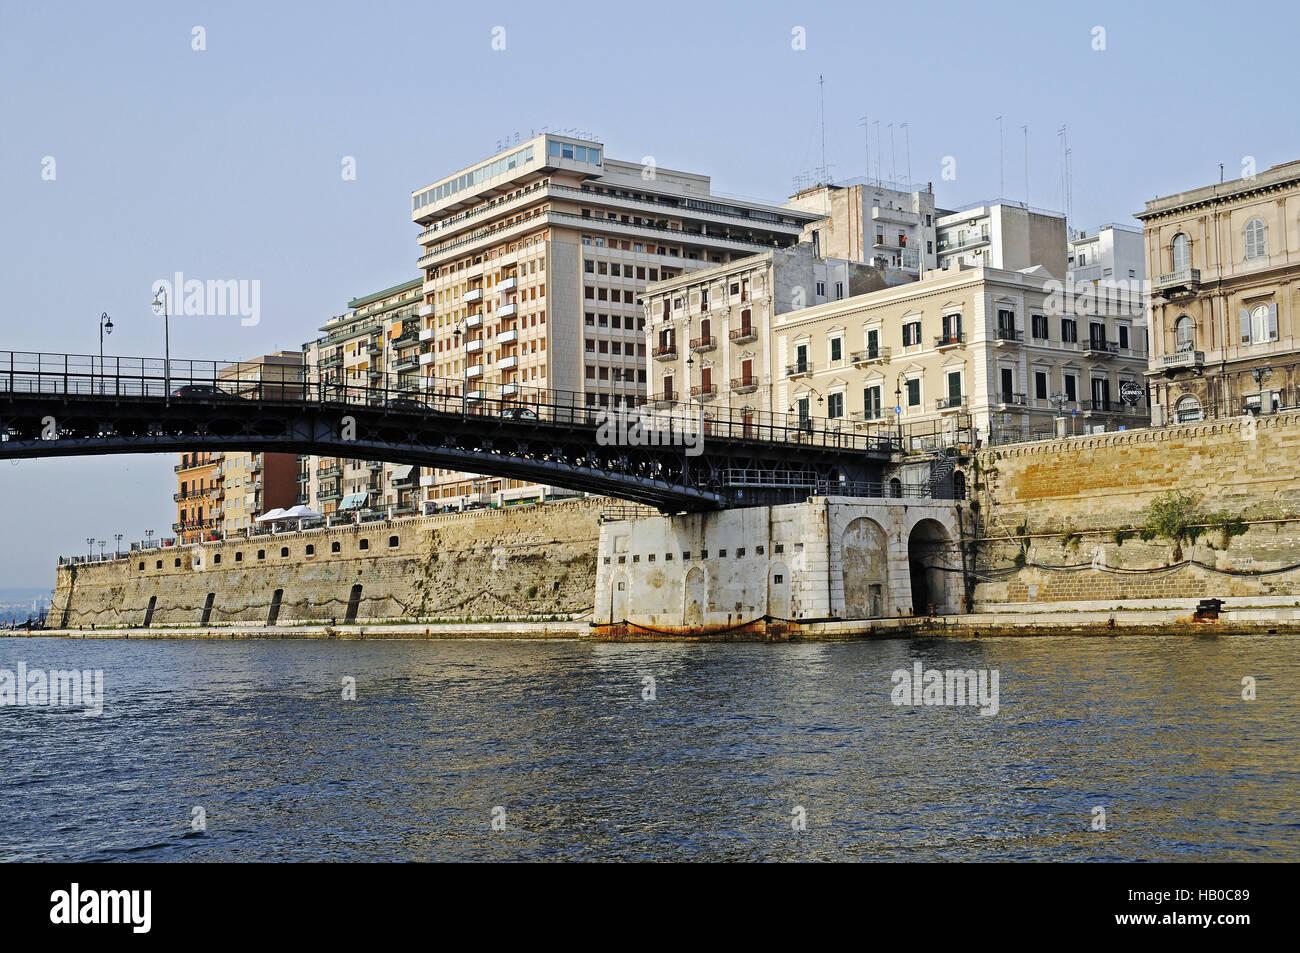 Ponte Girevole, swingbridge, Taranto, Italy - Stock Image